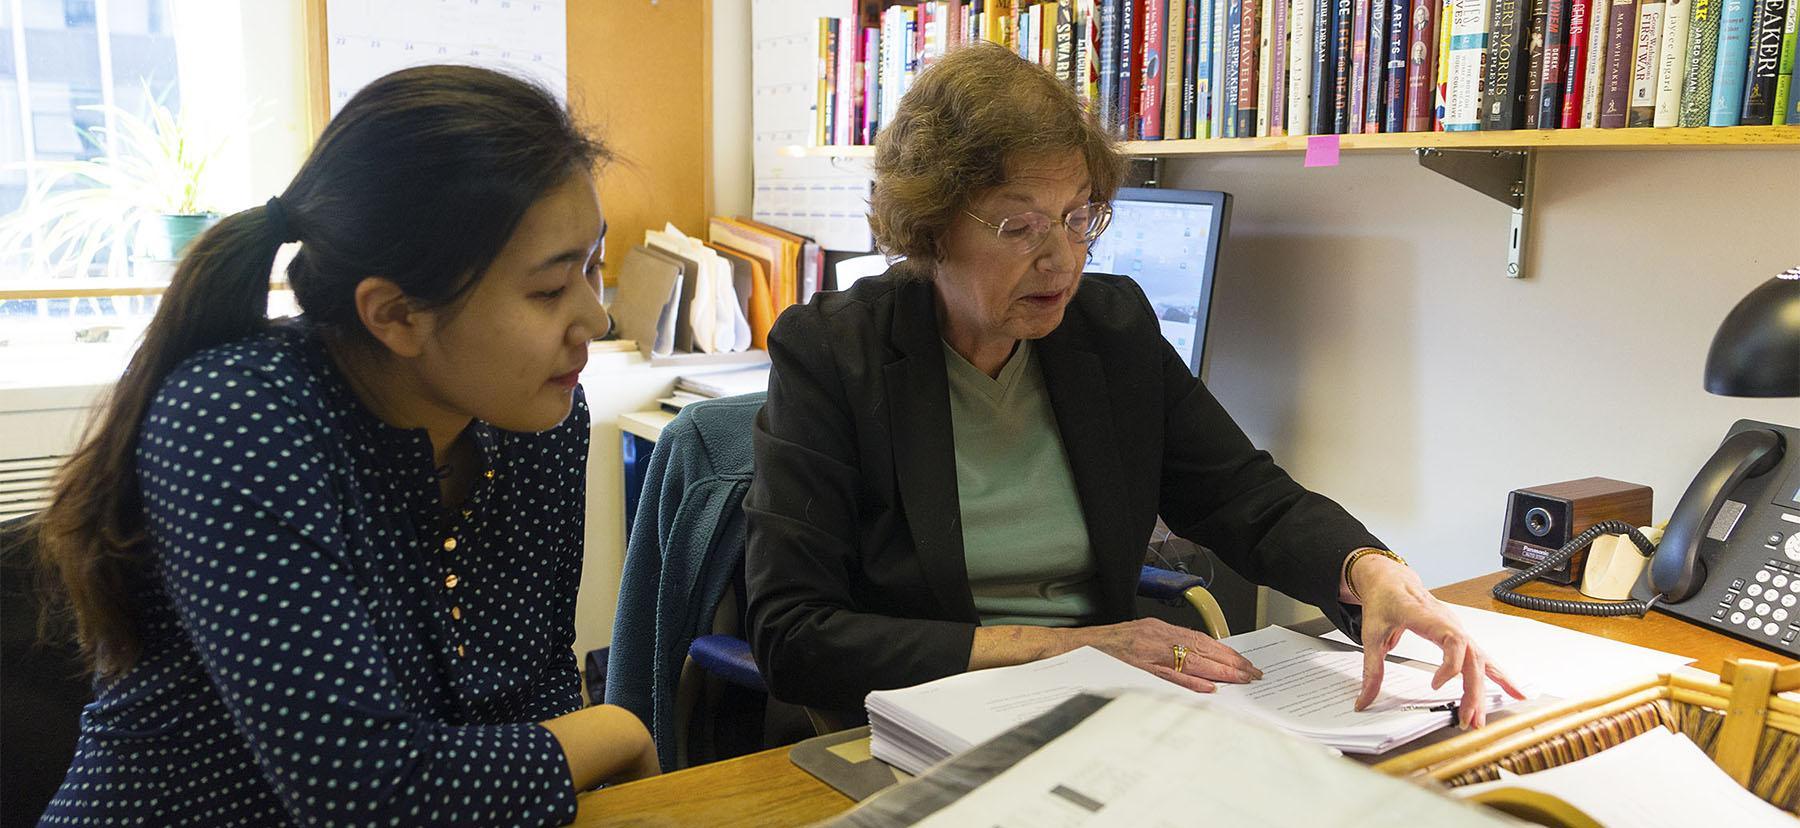 Jenny Ahn '17 shadowing Lisa Healy BMC '73, a senior production editor at Simon & Schuster in New York City.